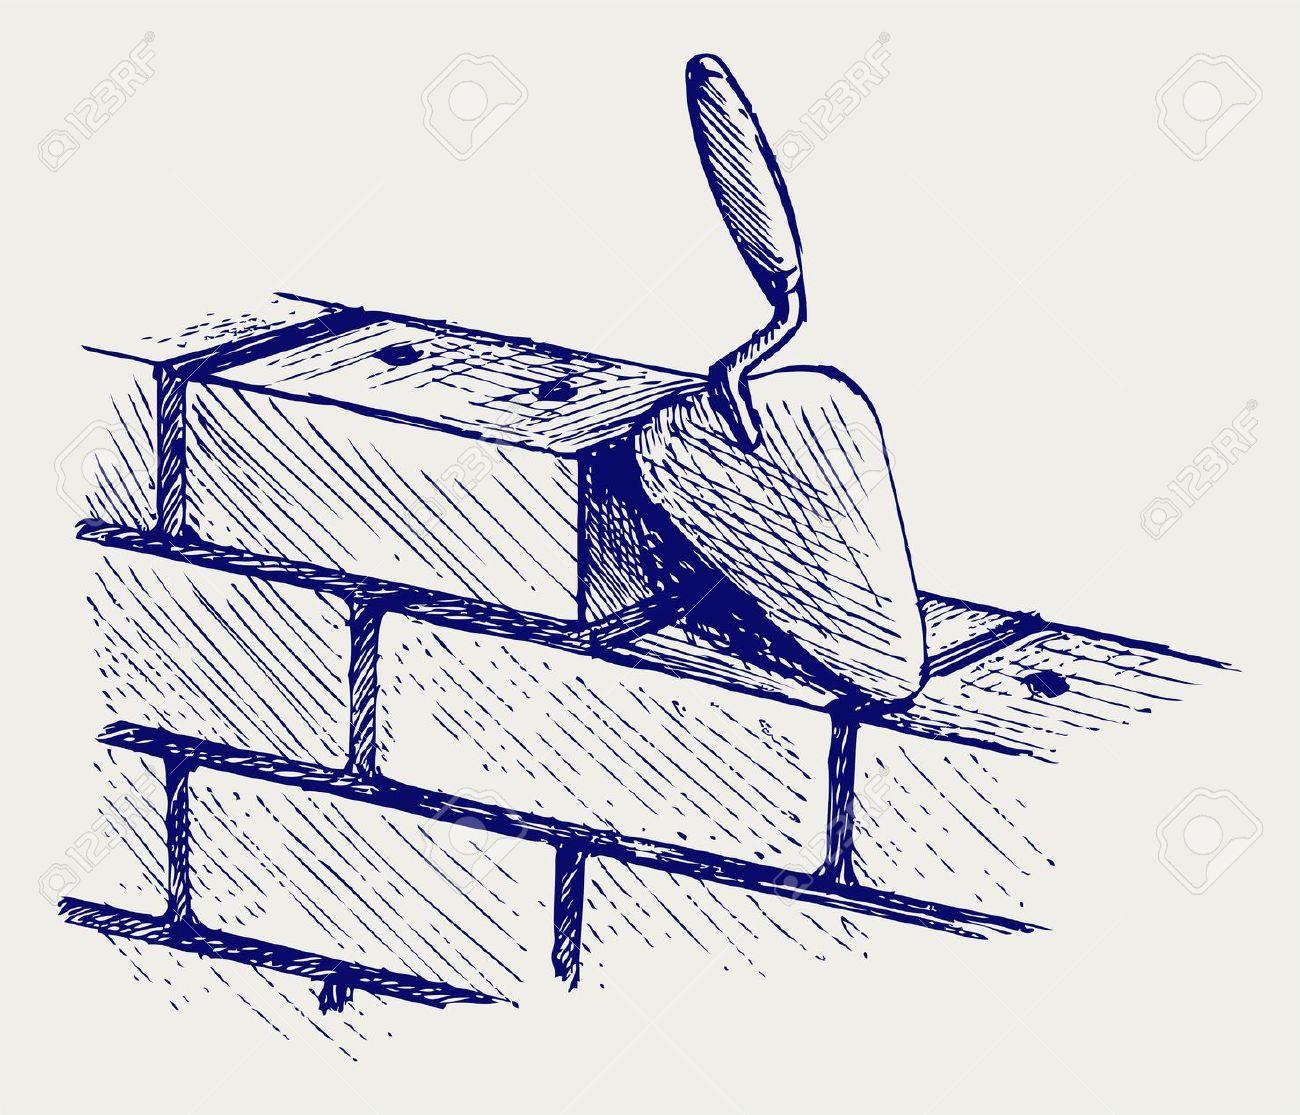 Trowel and bricks.